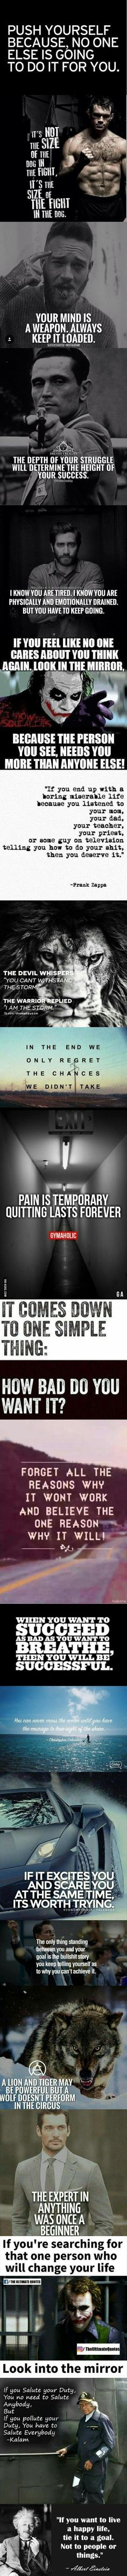 Feel like giving up?